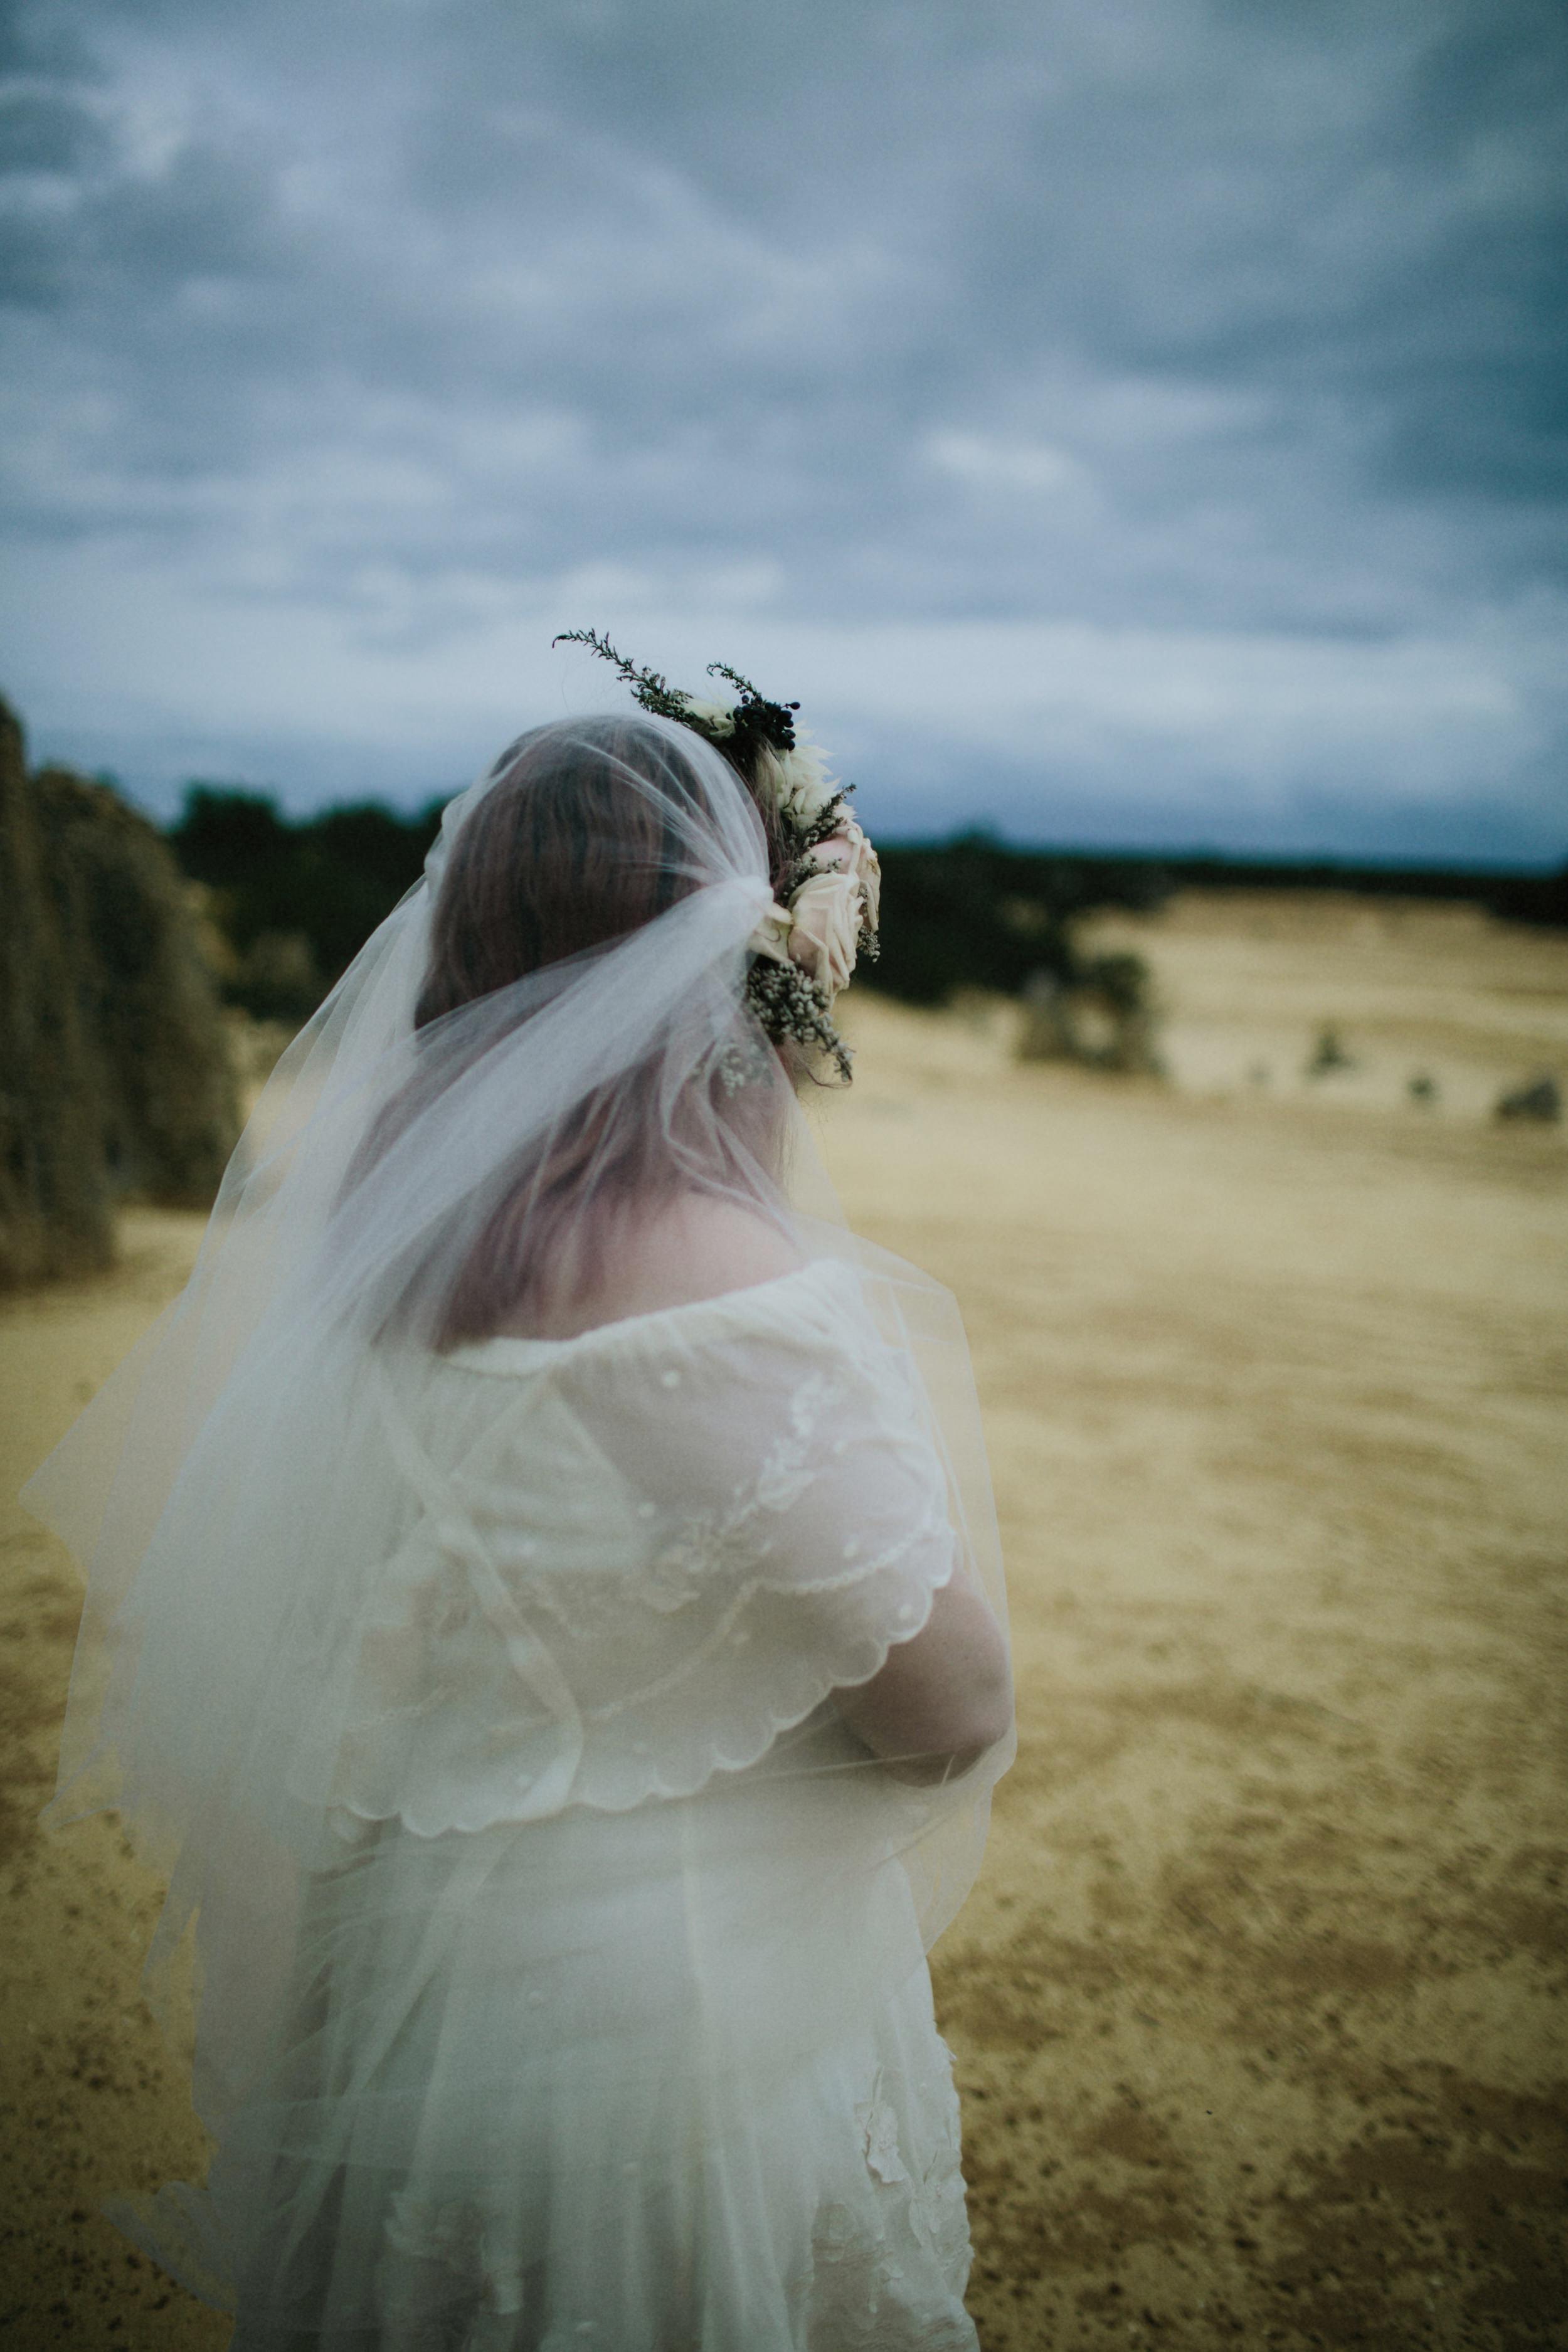 I-Got-You-Babe-Weddings-Hannah-Brent-Anniversary0047.JPG